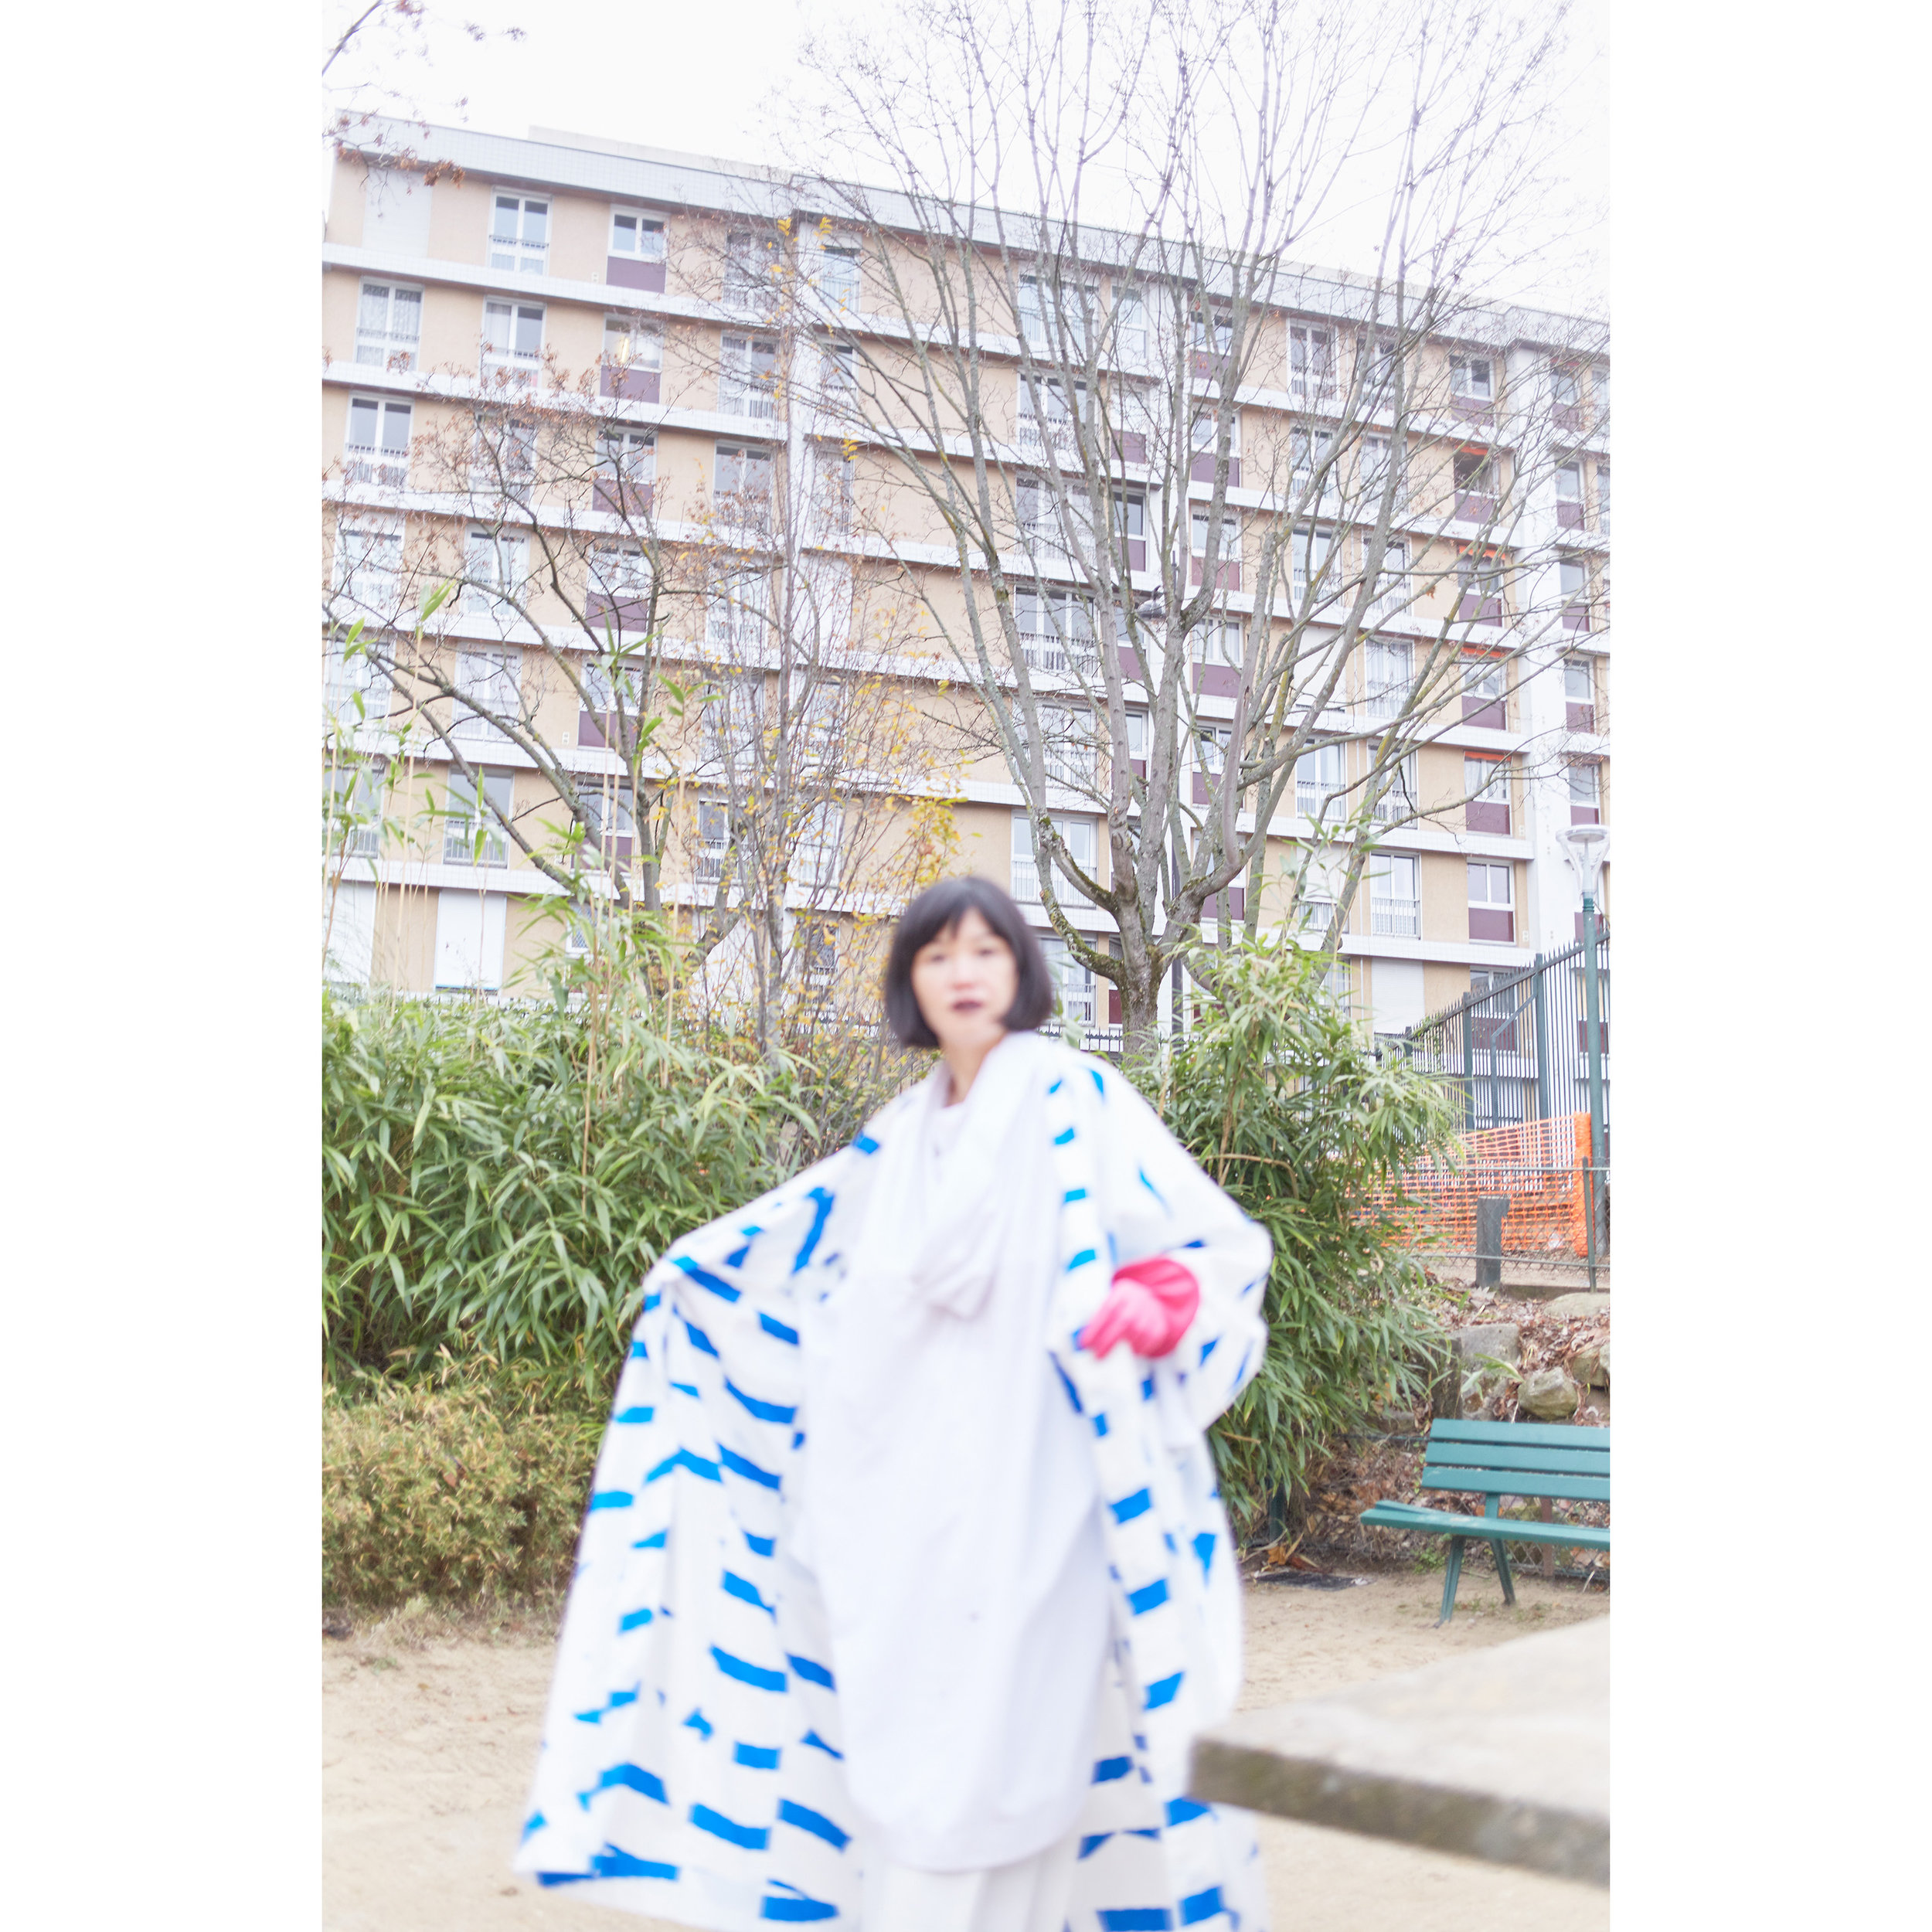 KumisoloKabuki_2207_V1.jpg